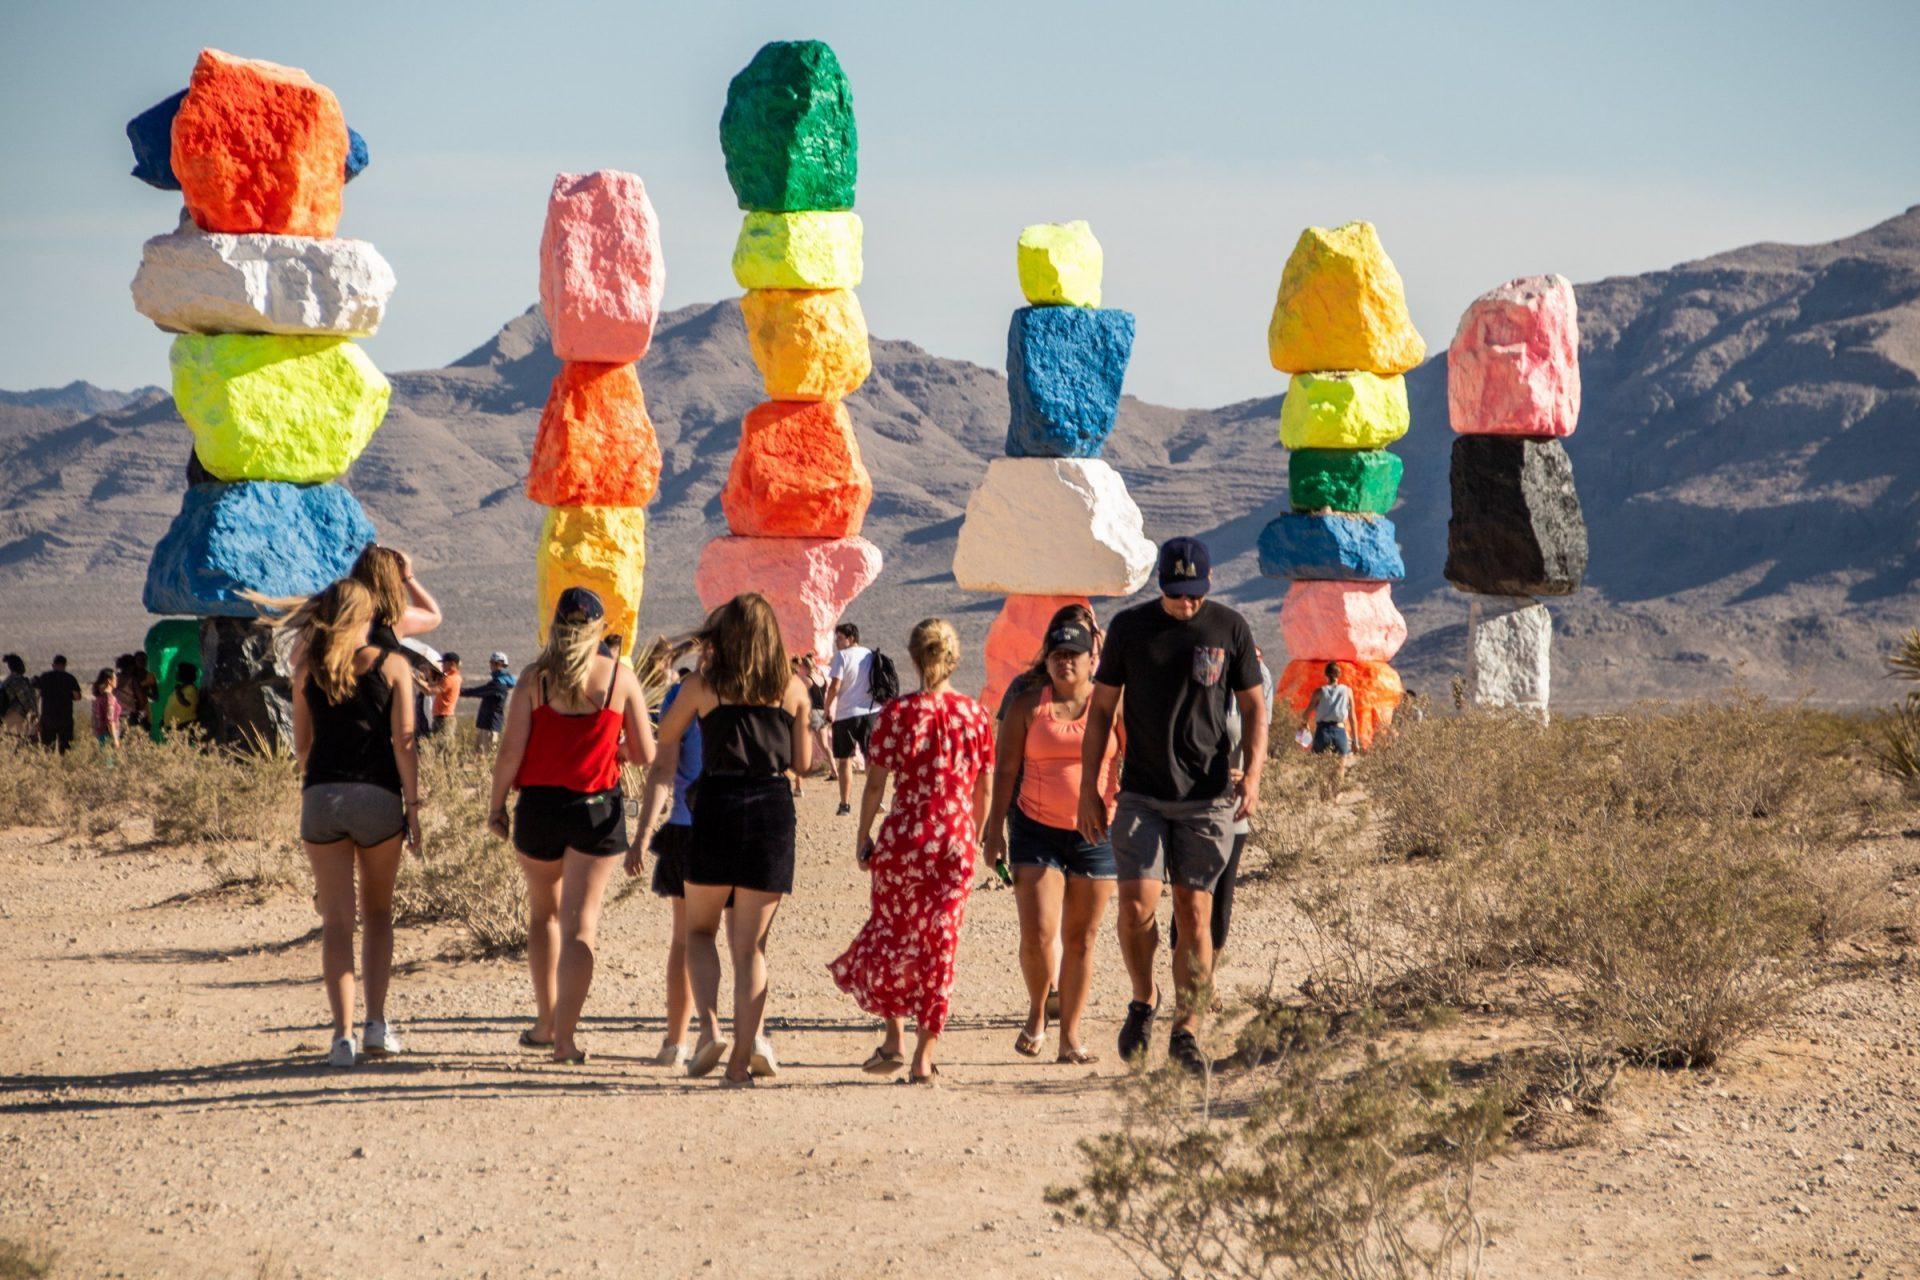 People Around Colorful Boulder Art Installation